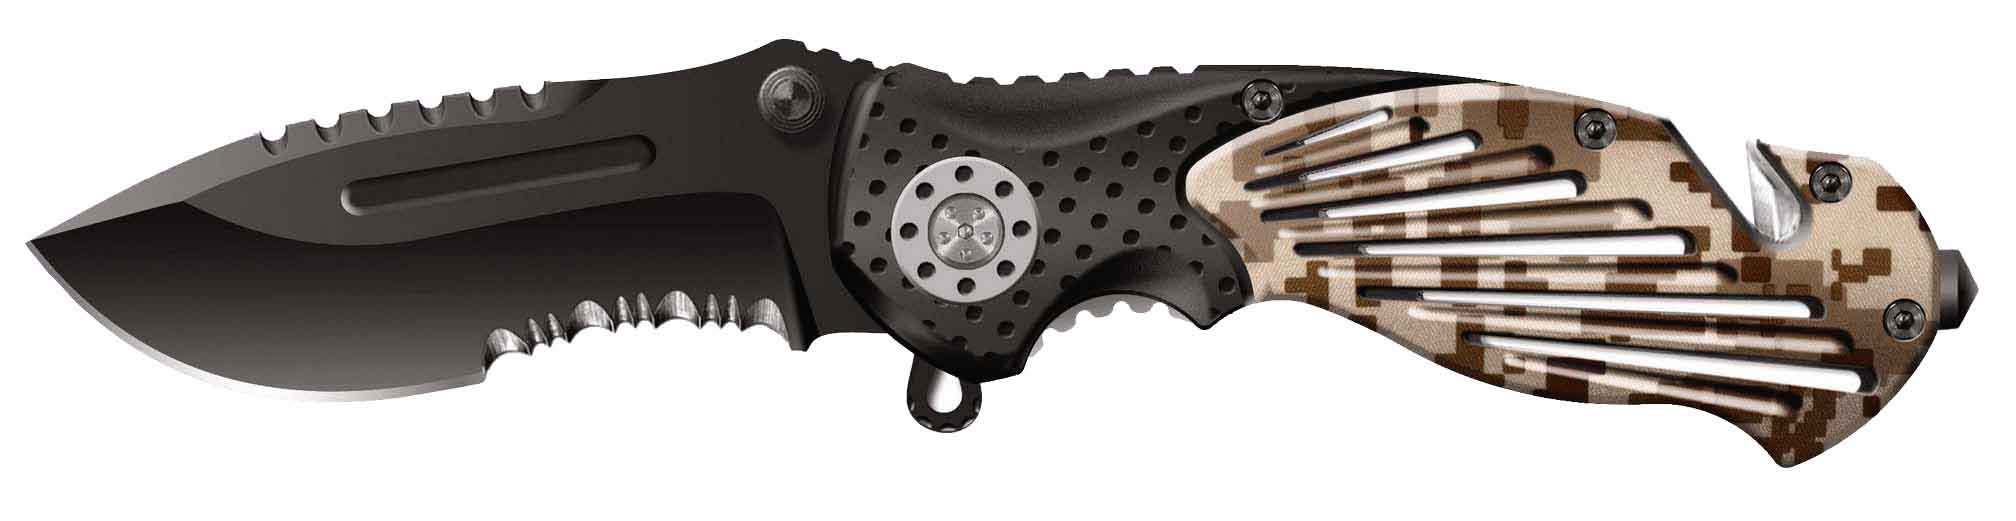 Нож складной Stinger SA-580DC, сталь 420, алюминий нож складной stinger sa 574b сталь 420 алюминий